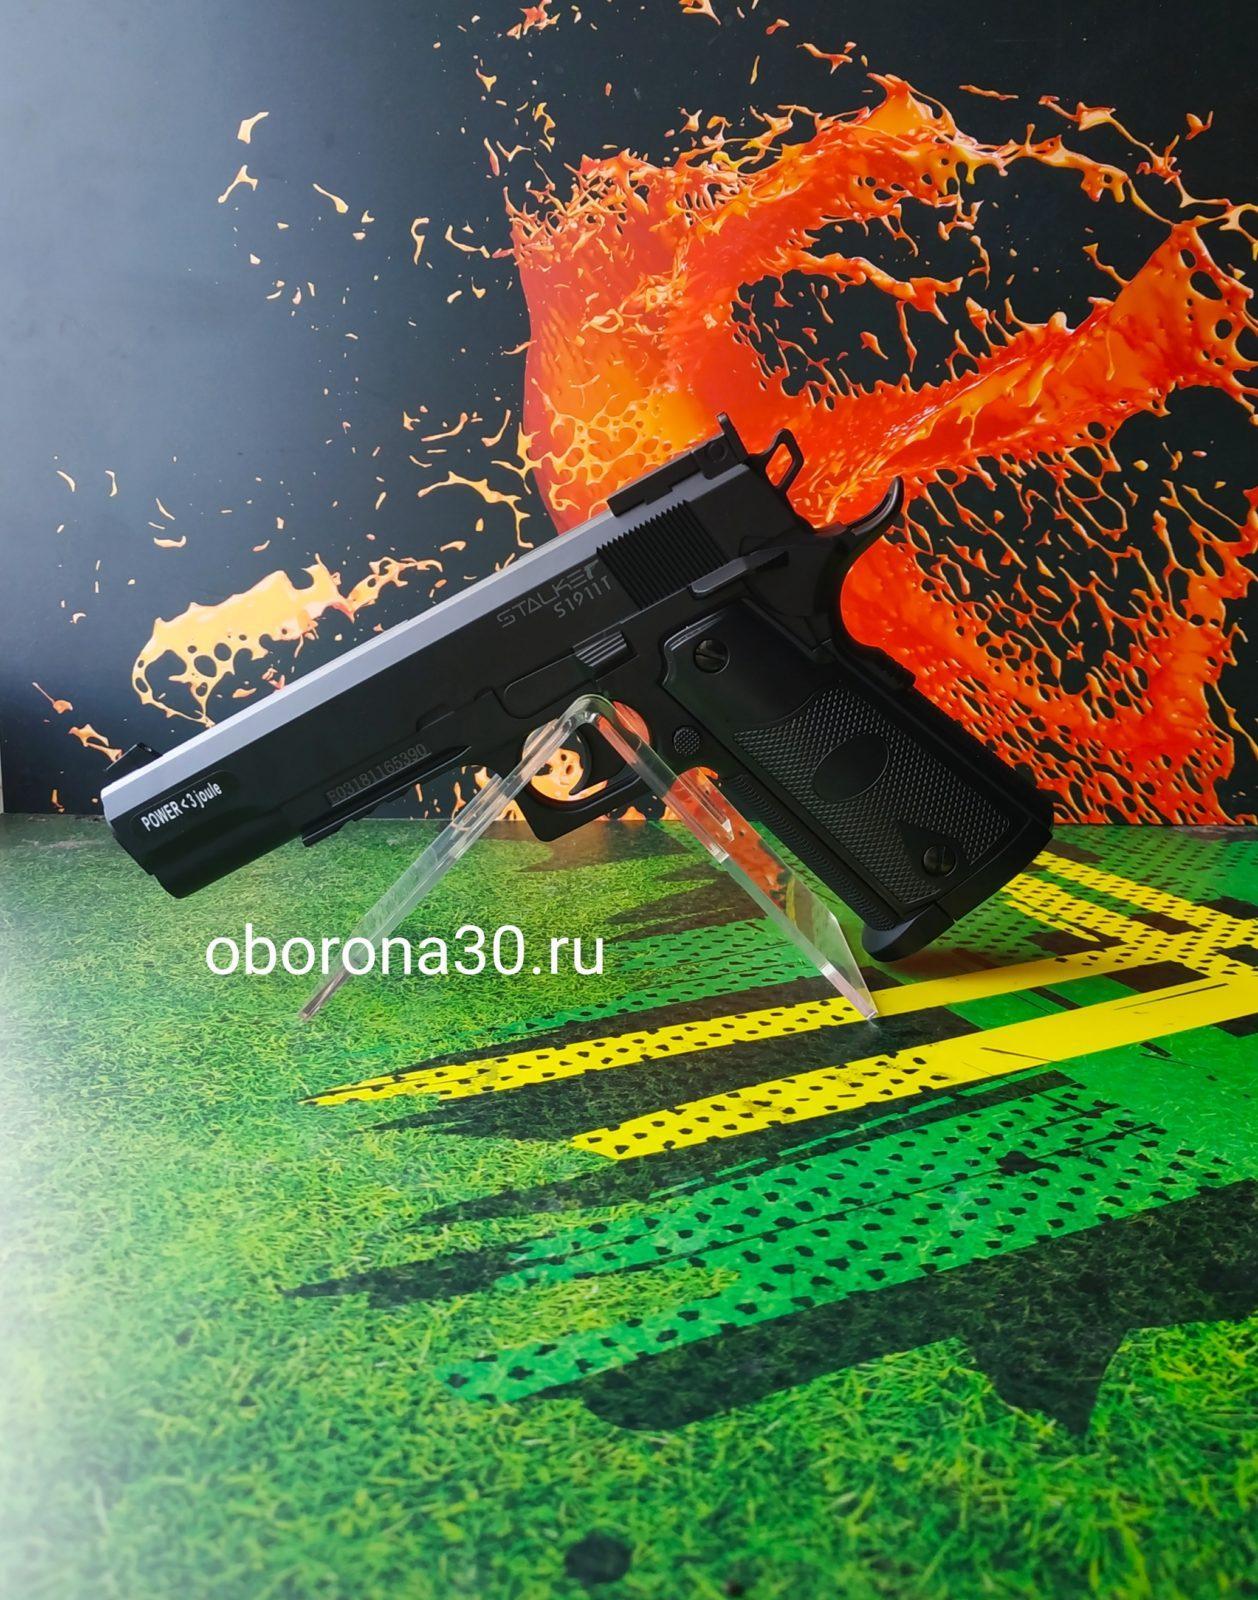 Пистолет пневматический Colt 1911 (Stalker S1911T, Китай)